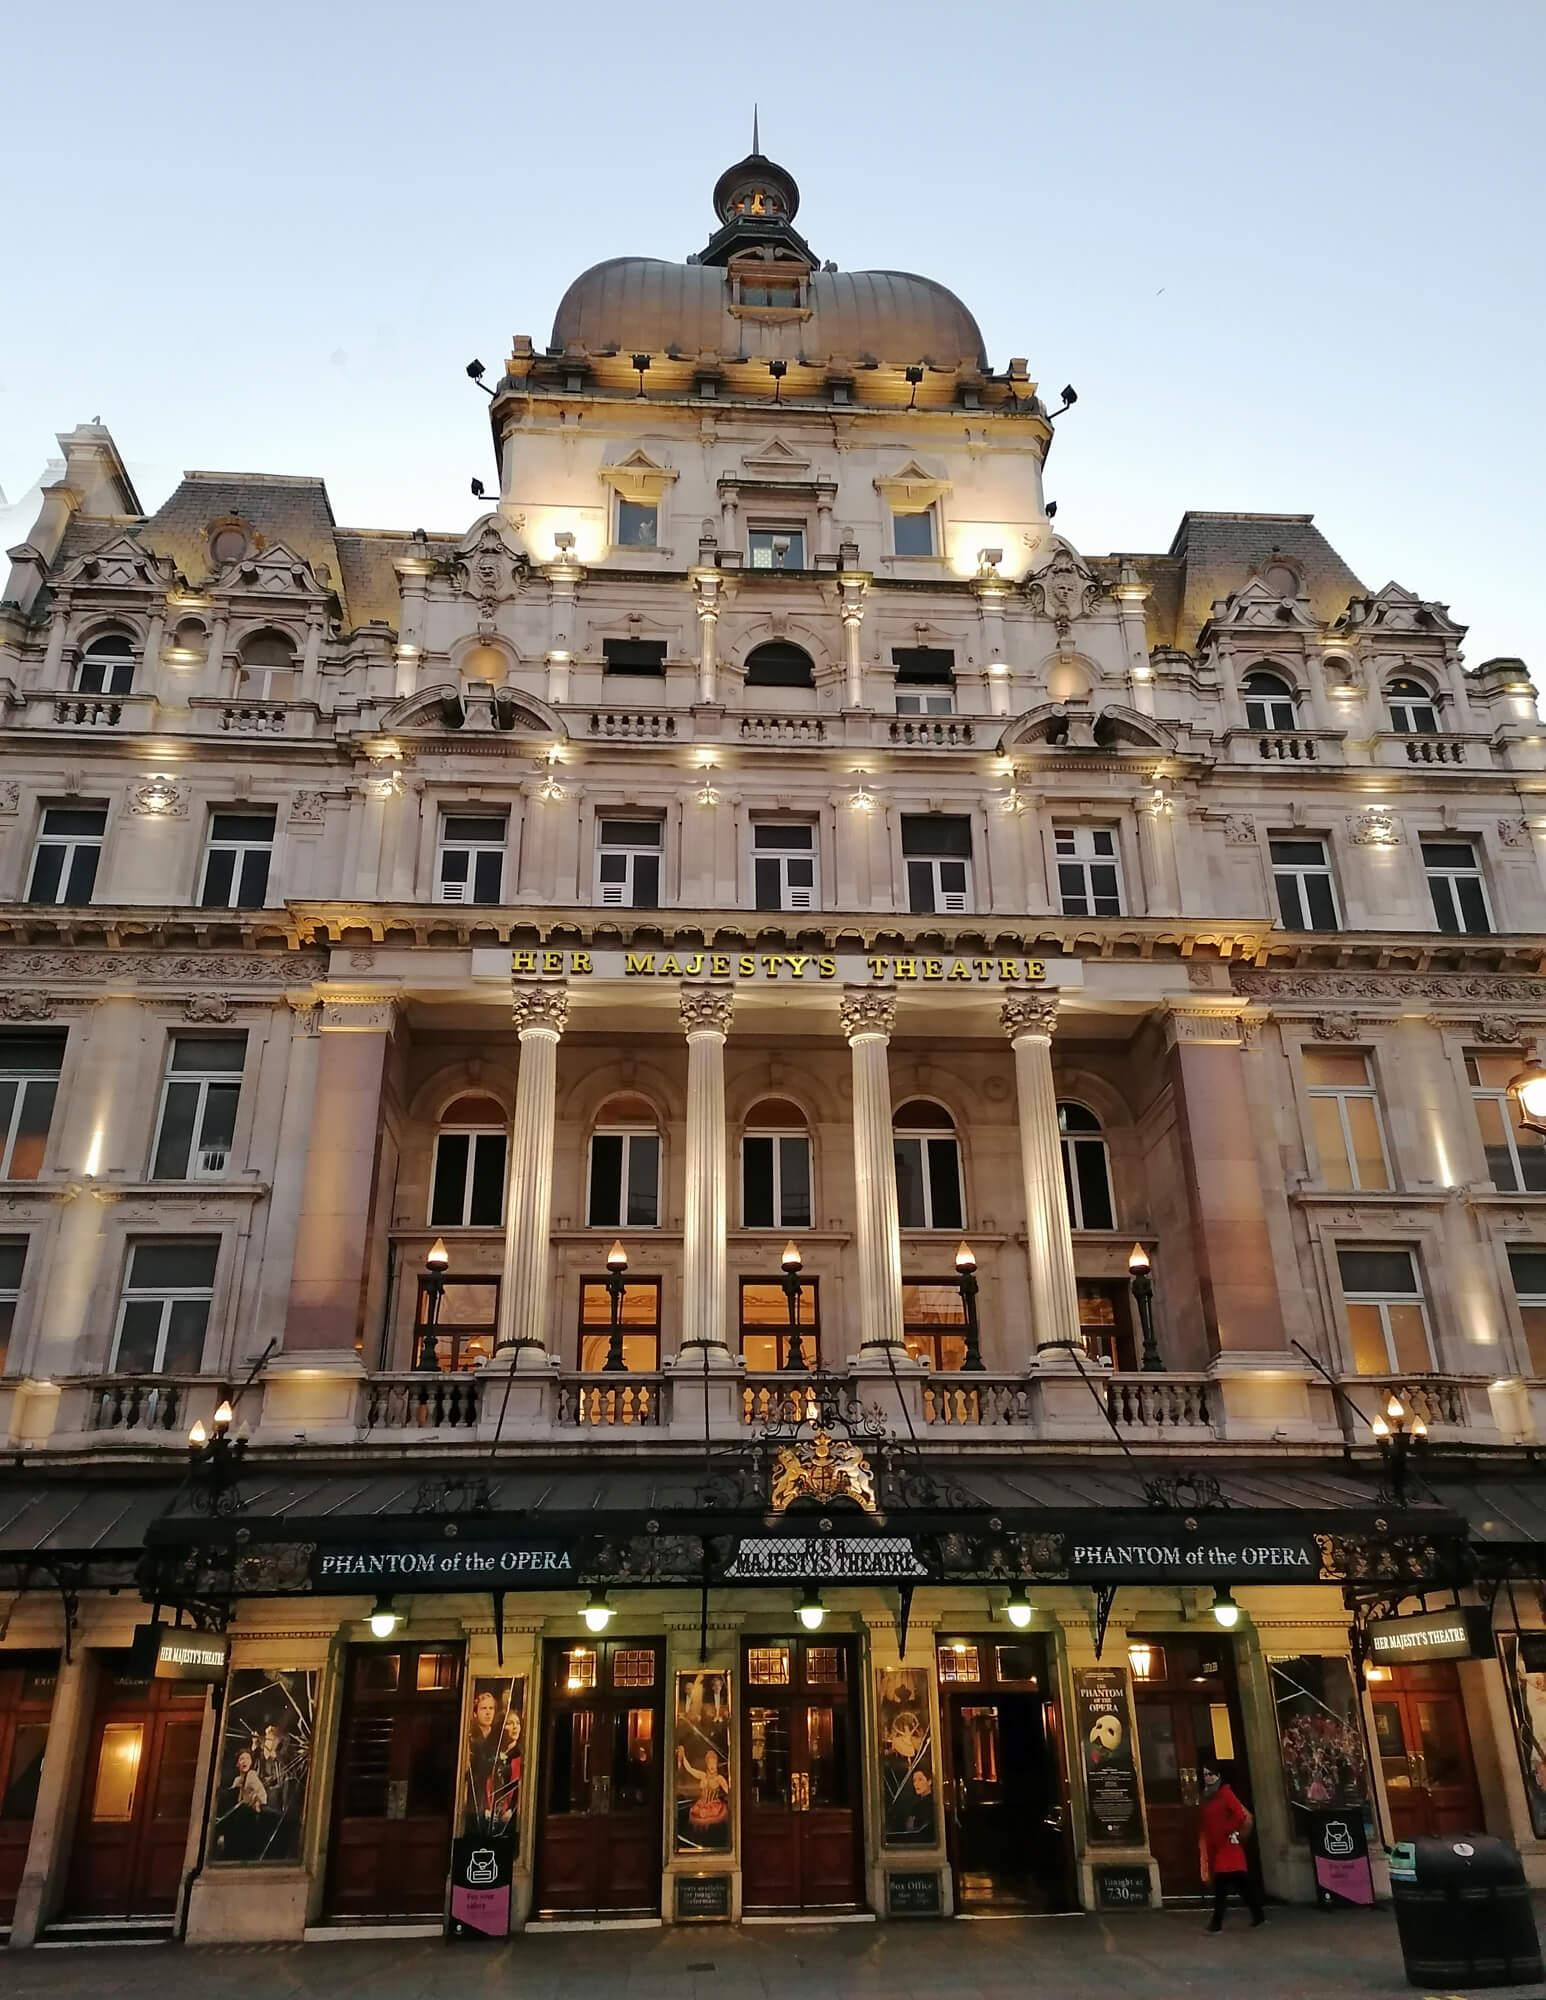 The Phantom of the Opera Her Majesty's Theatre